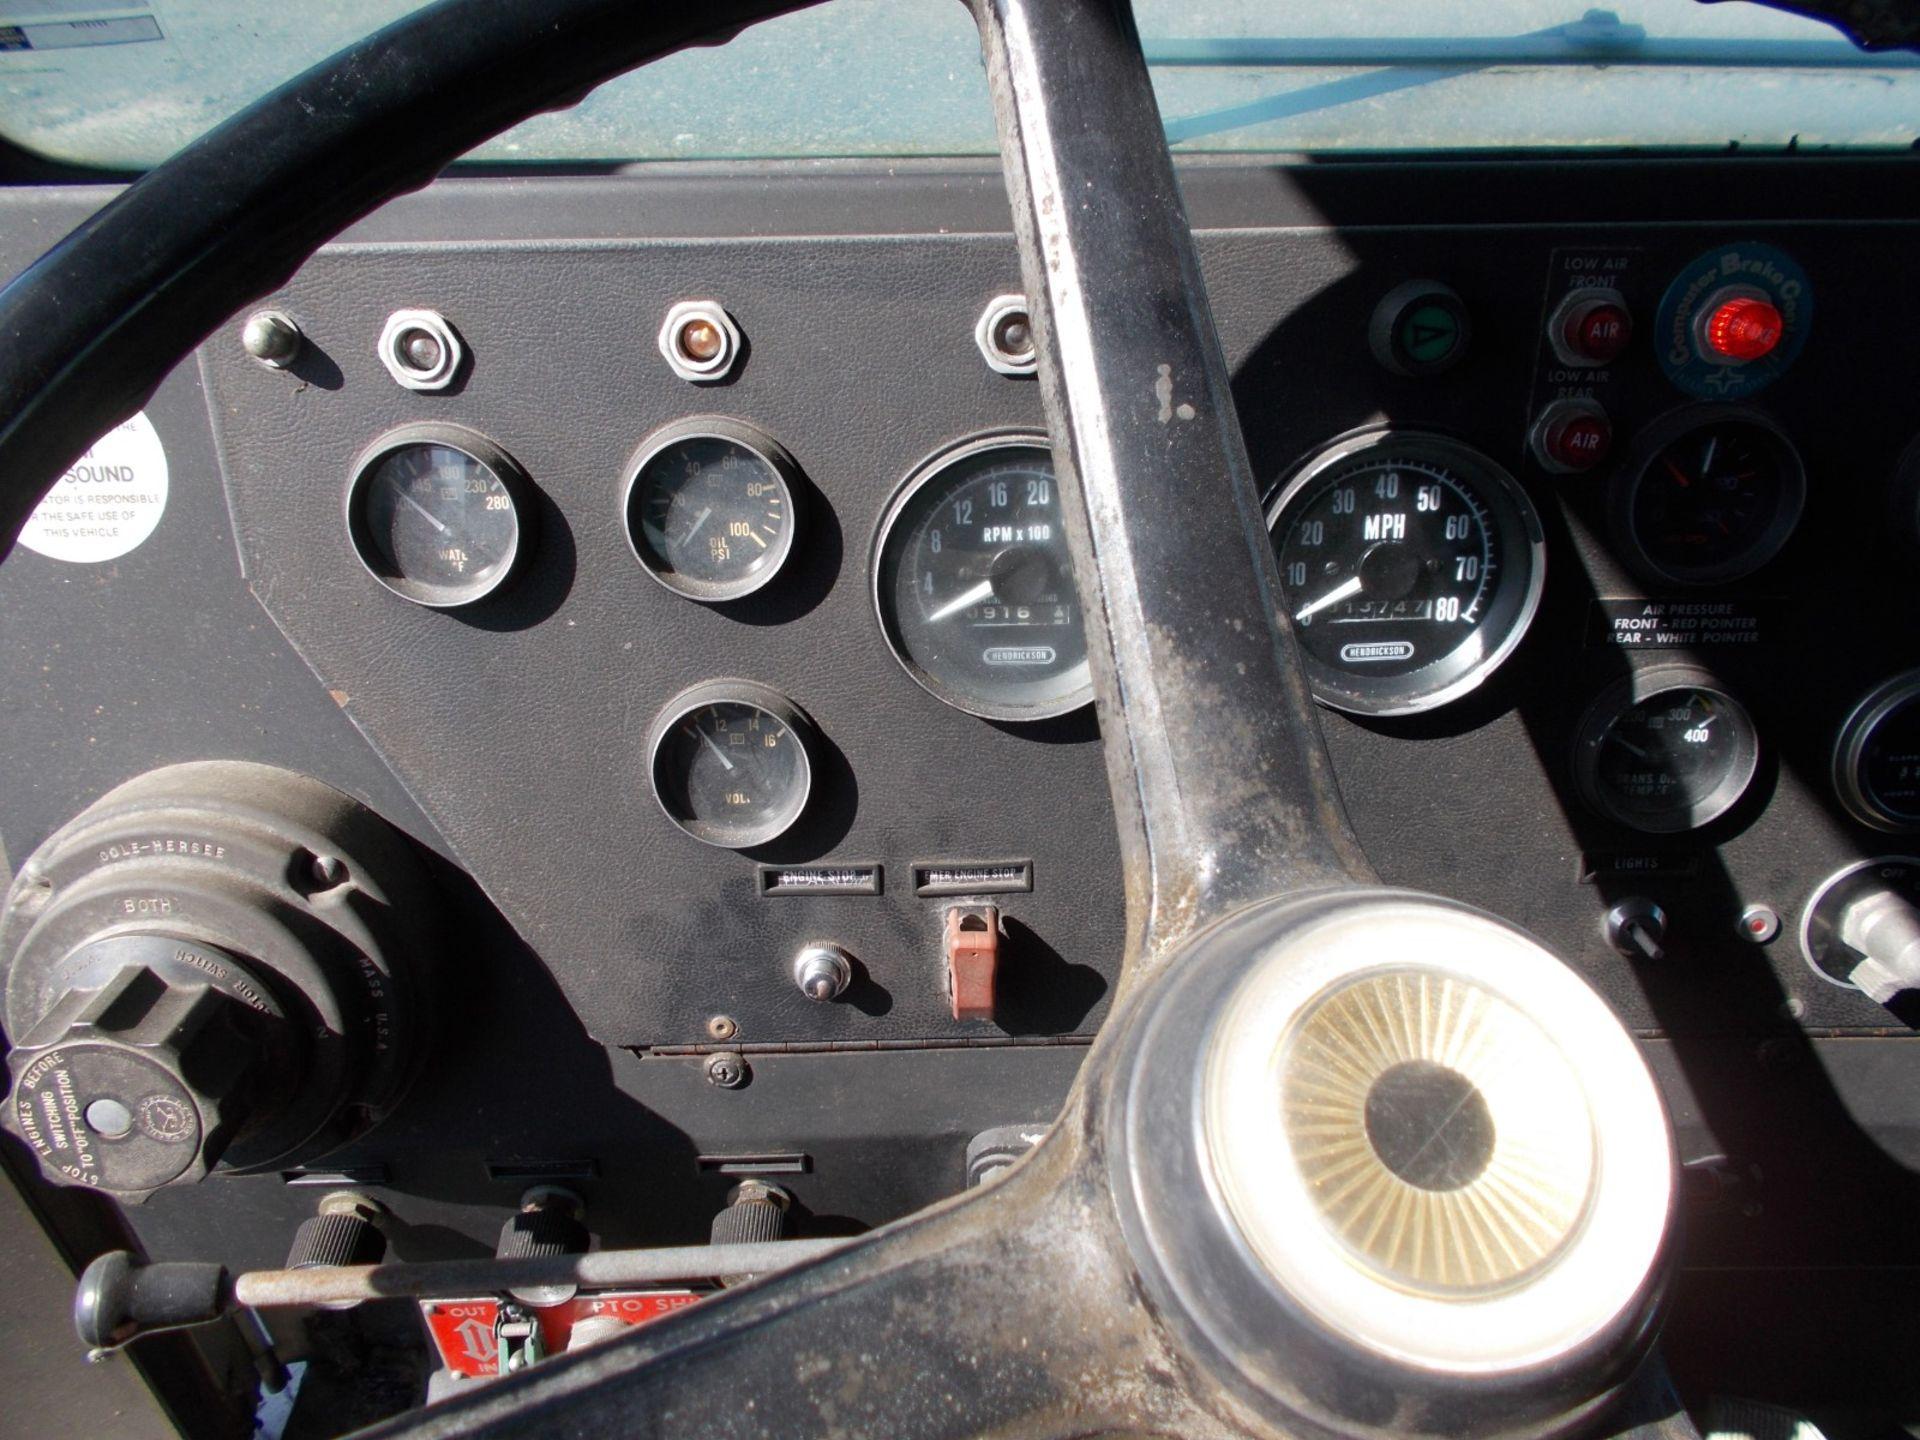 1978 HENDRICKSON 871-LPS SNORKEL FIRE TRUCK, U.S. IMPORT, 7.0 LITRE DETROIT DIESEL ENGINE *PLUS VAT* - Image 19 of 22